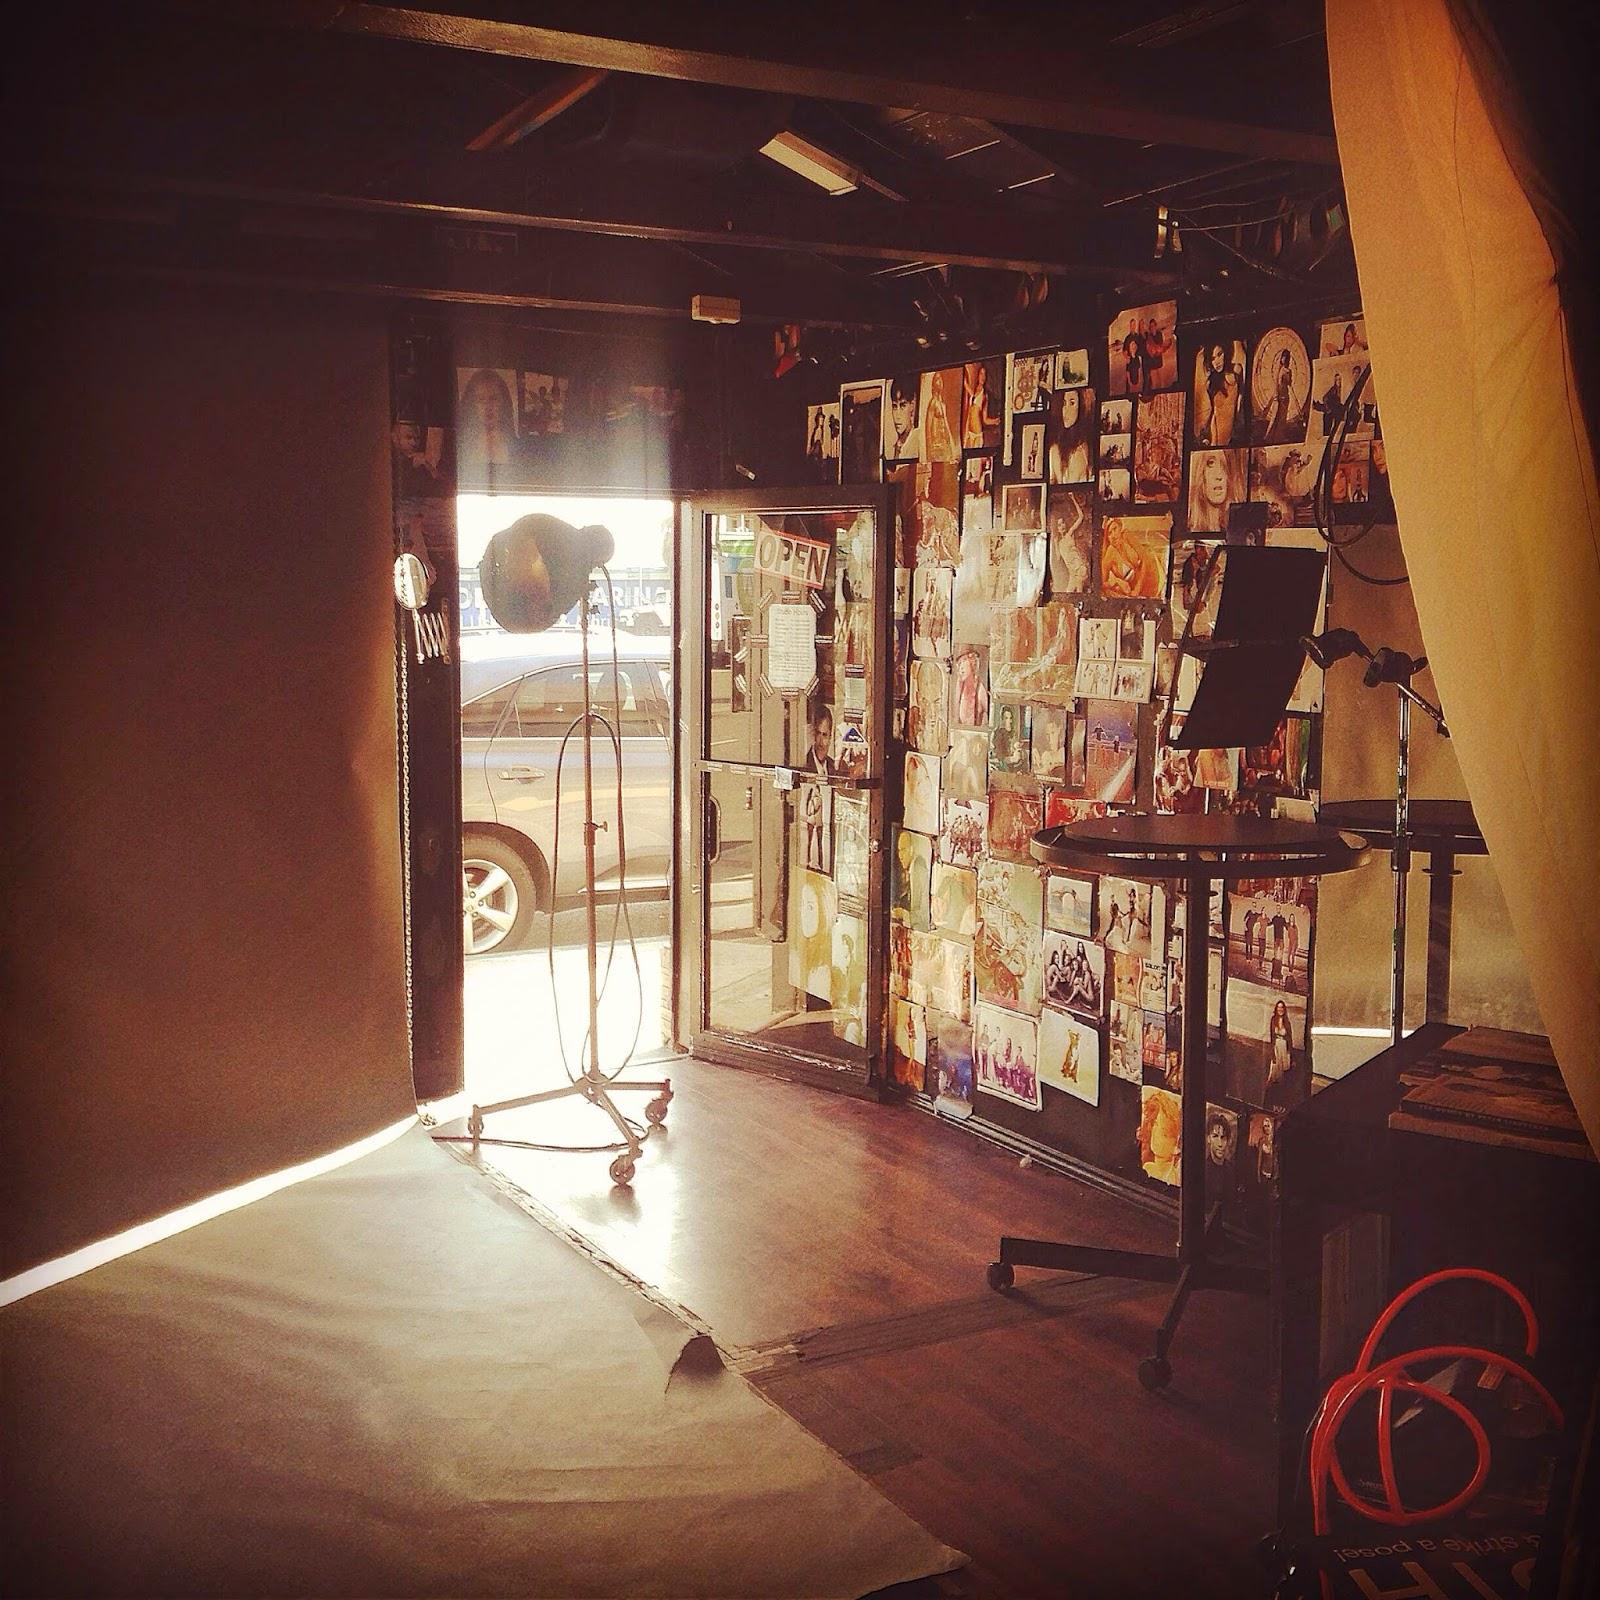 Orange County 39 S Premiere Interior Designers Skd Studios In Newport Beach Specializing In Kitchen